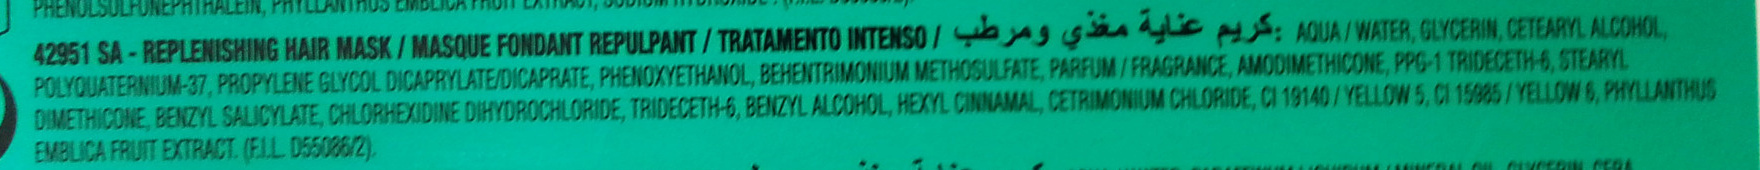 Amla Legend - Ingredients